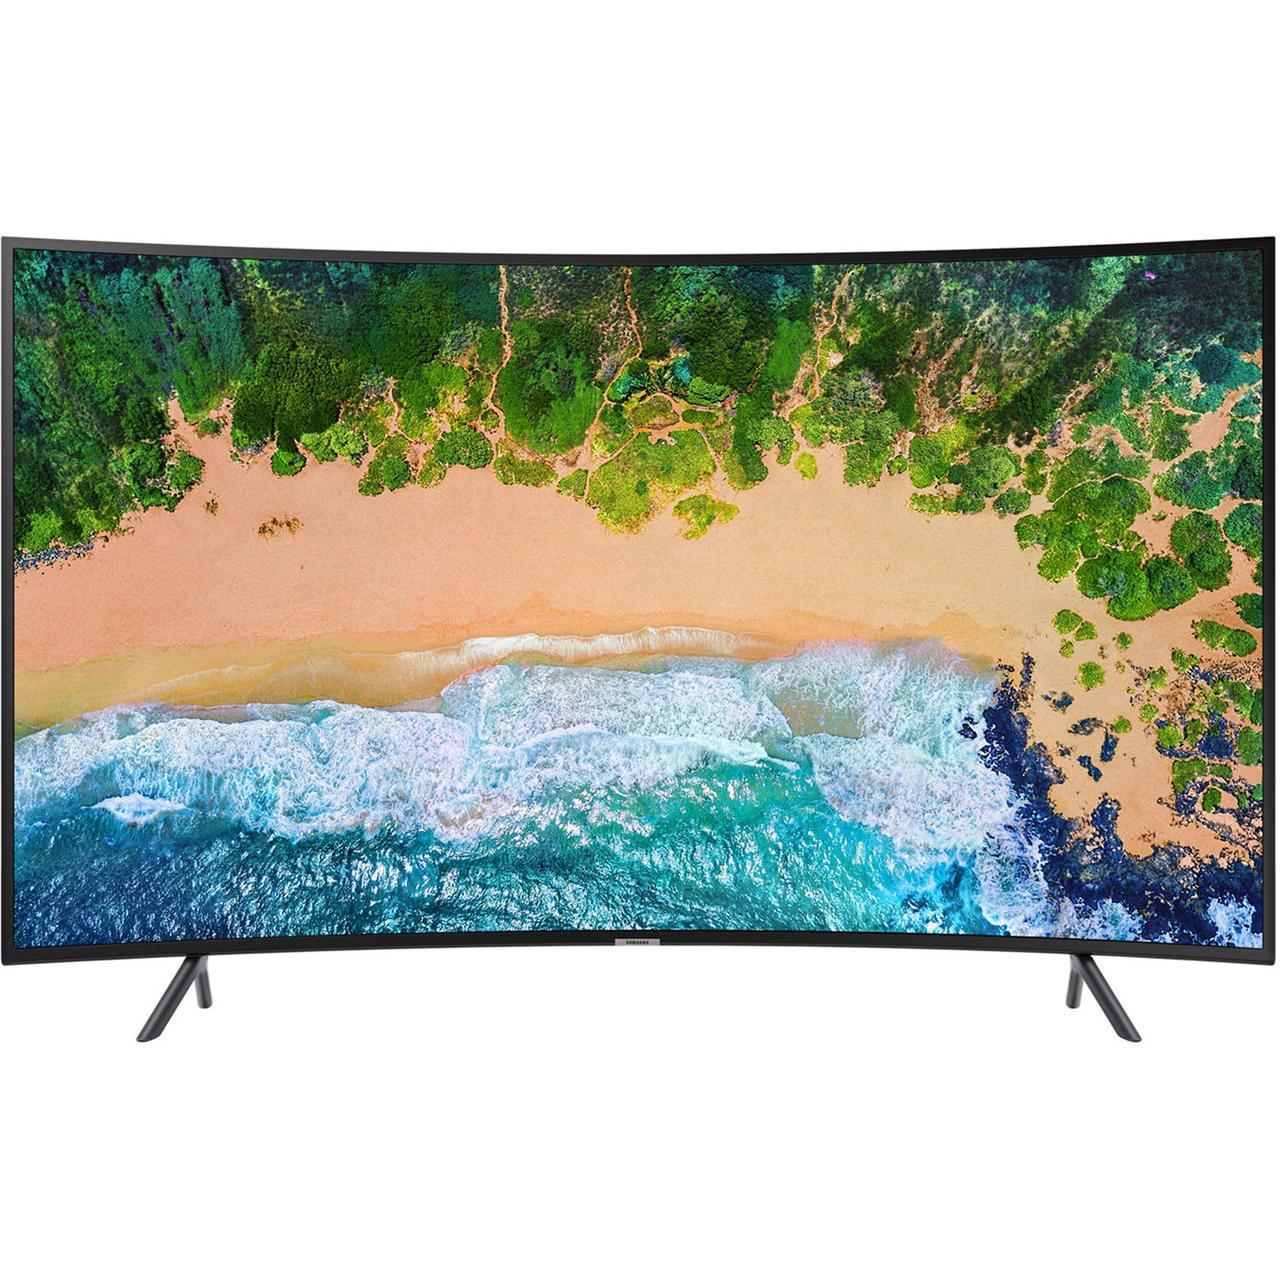 "Телевизор гнутый Samsung 42"" Т2/С2, Full HD, LED, Smаrt TV (Chinese assembly)"